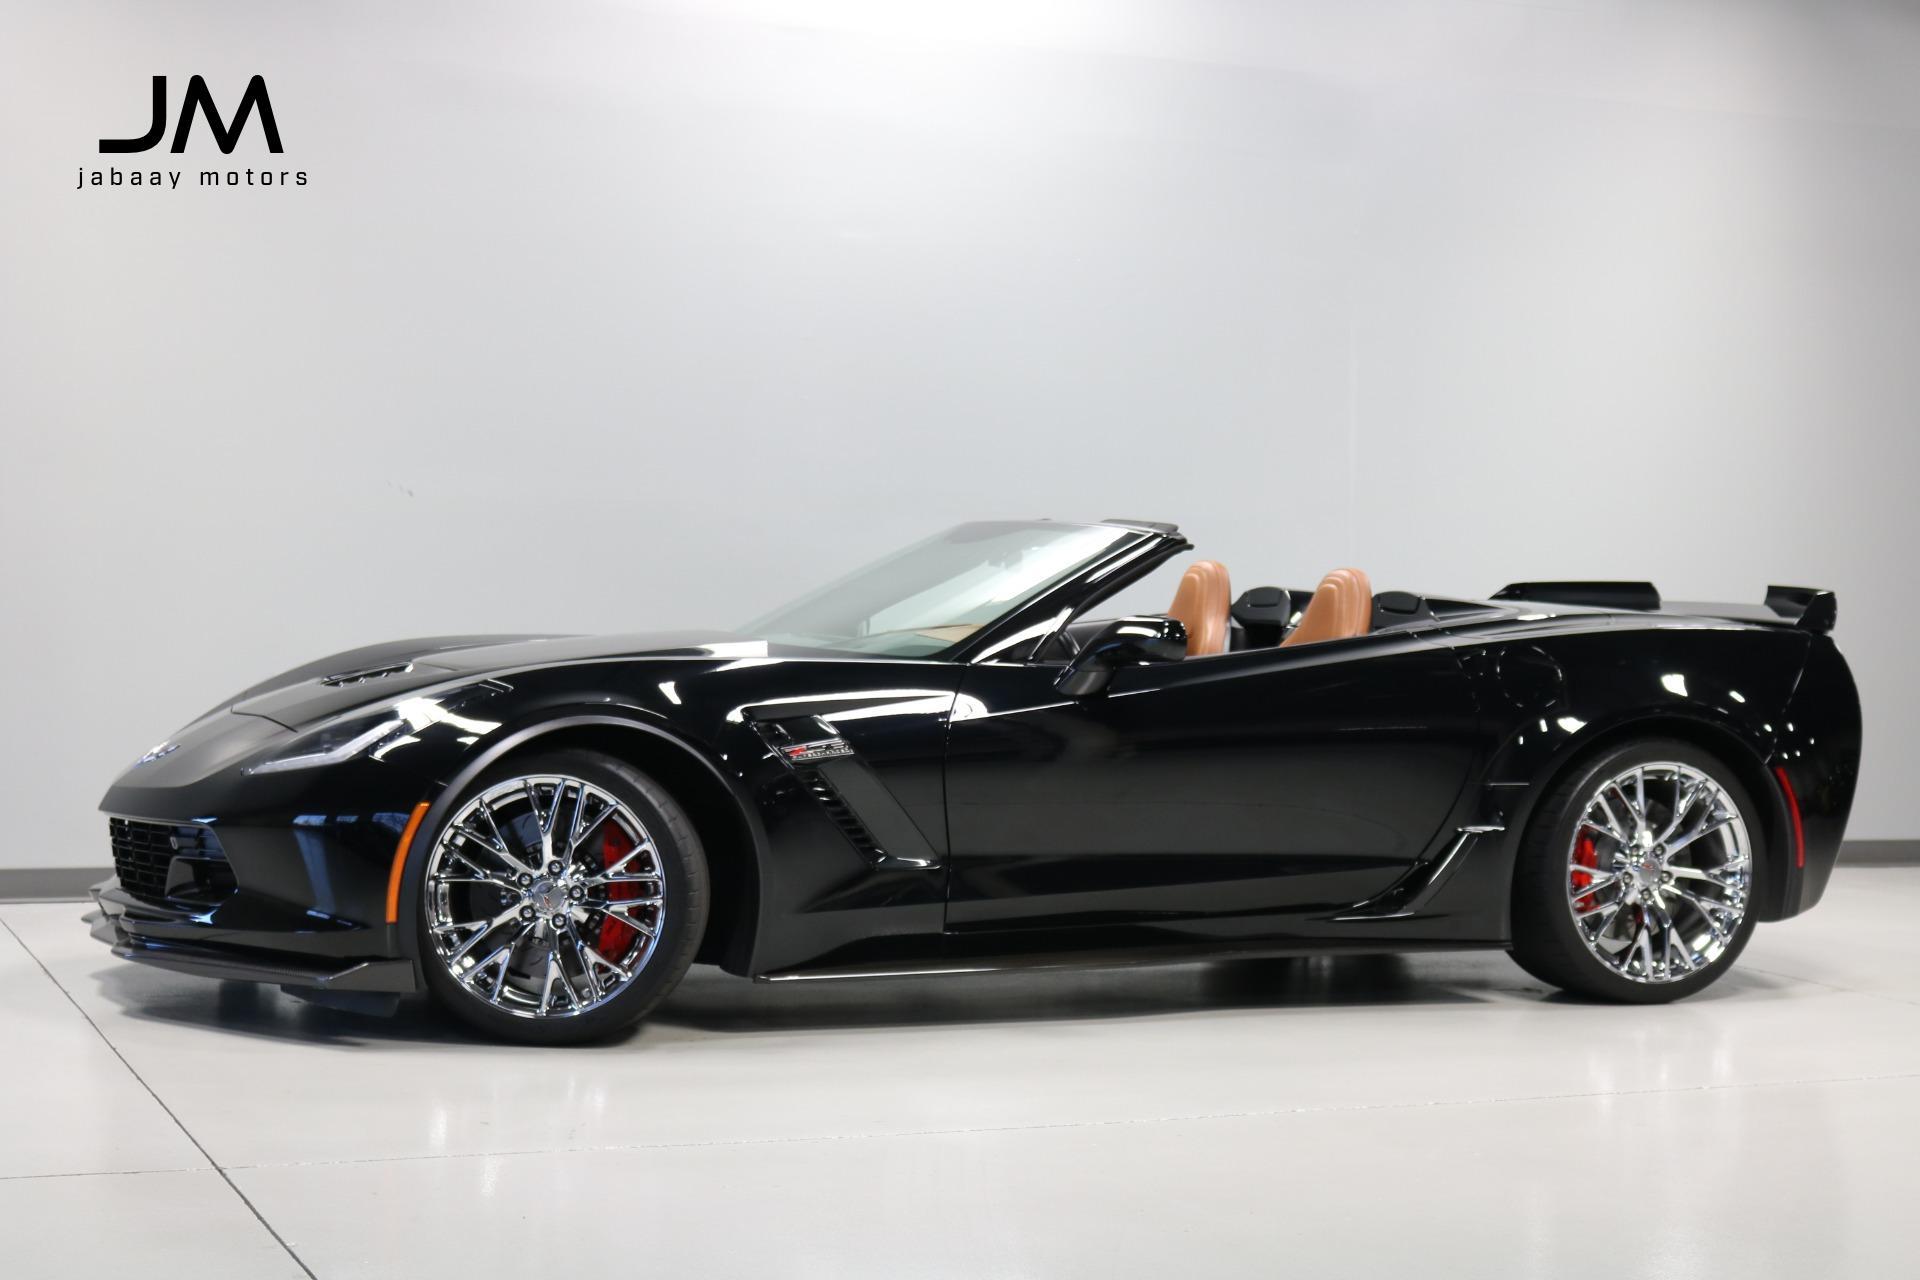 Used 2018 Chevrolet Corvette Z06 For Sale 82 000 Jabaay Motors Inc Stock Jm7504